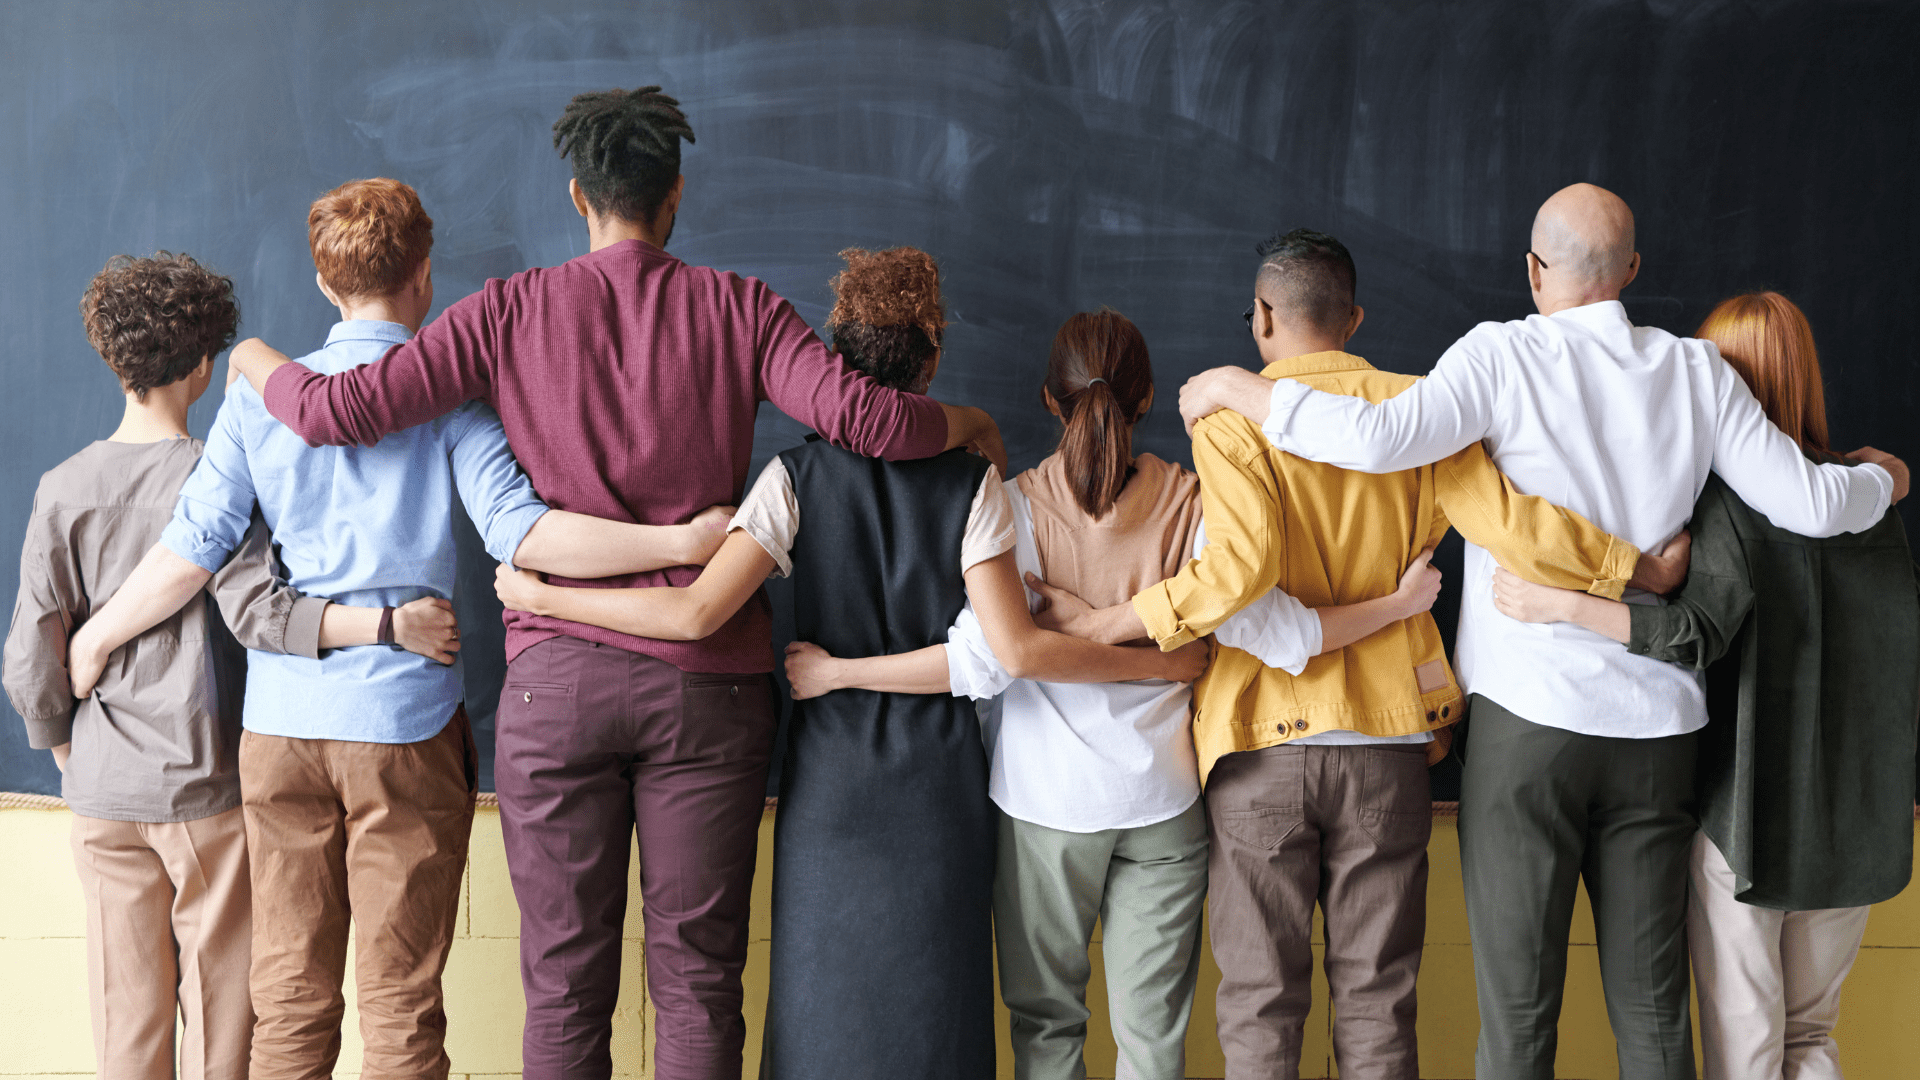 diversity, inclusion, equity, sfu, simon fraser university, education